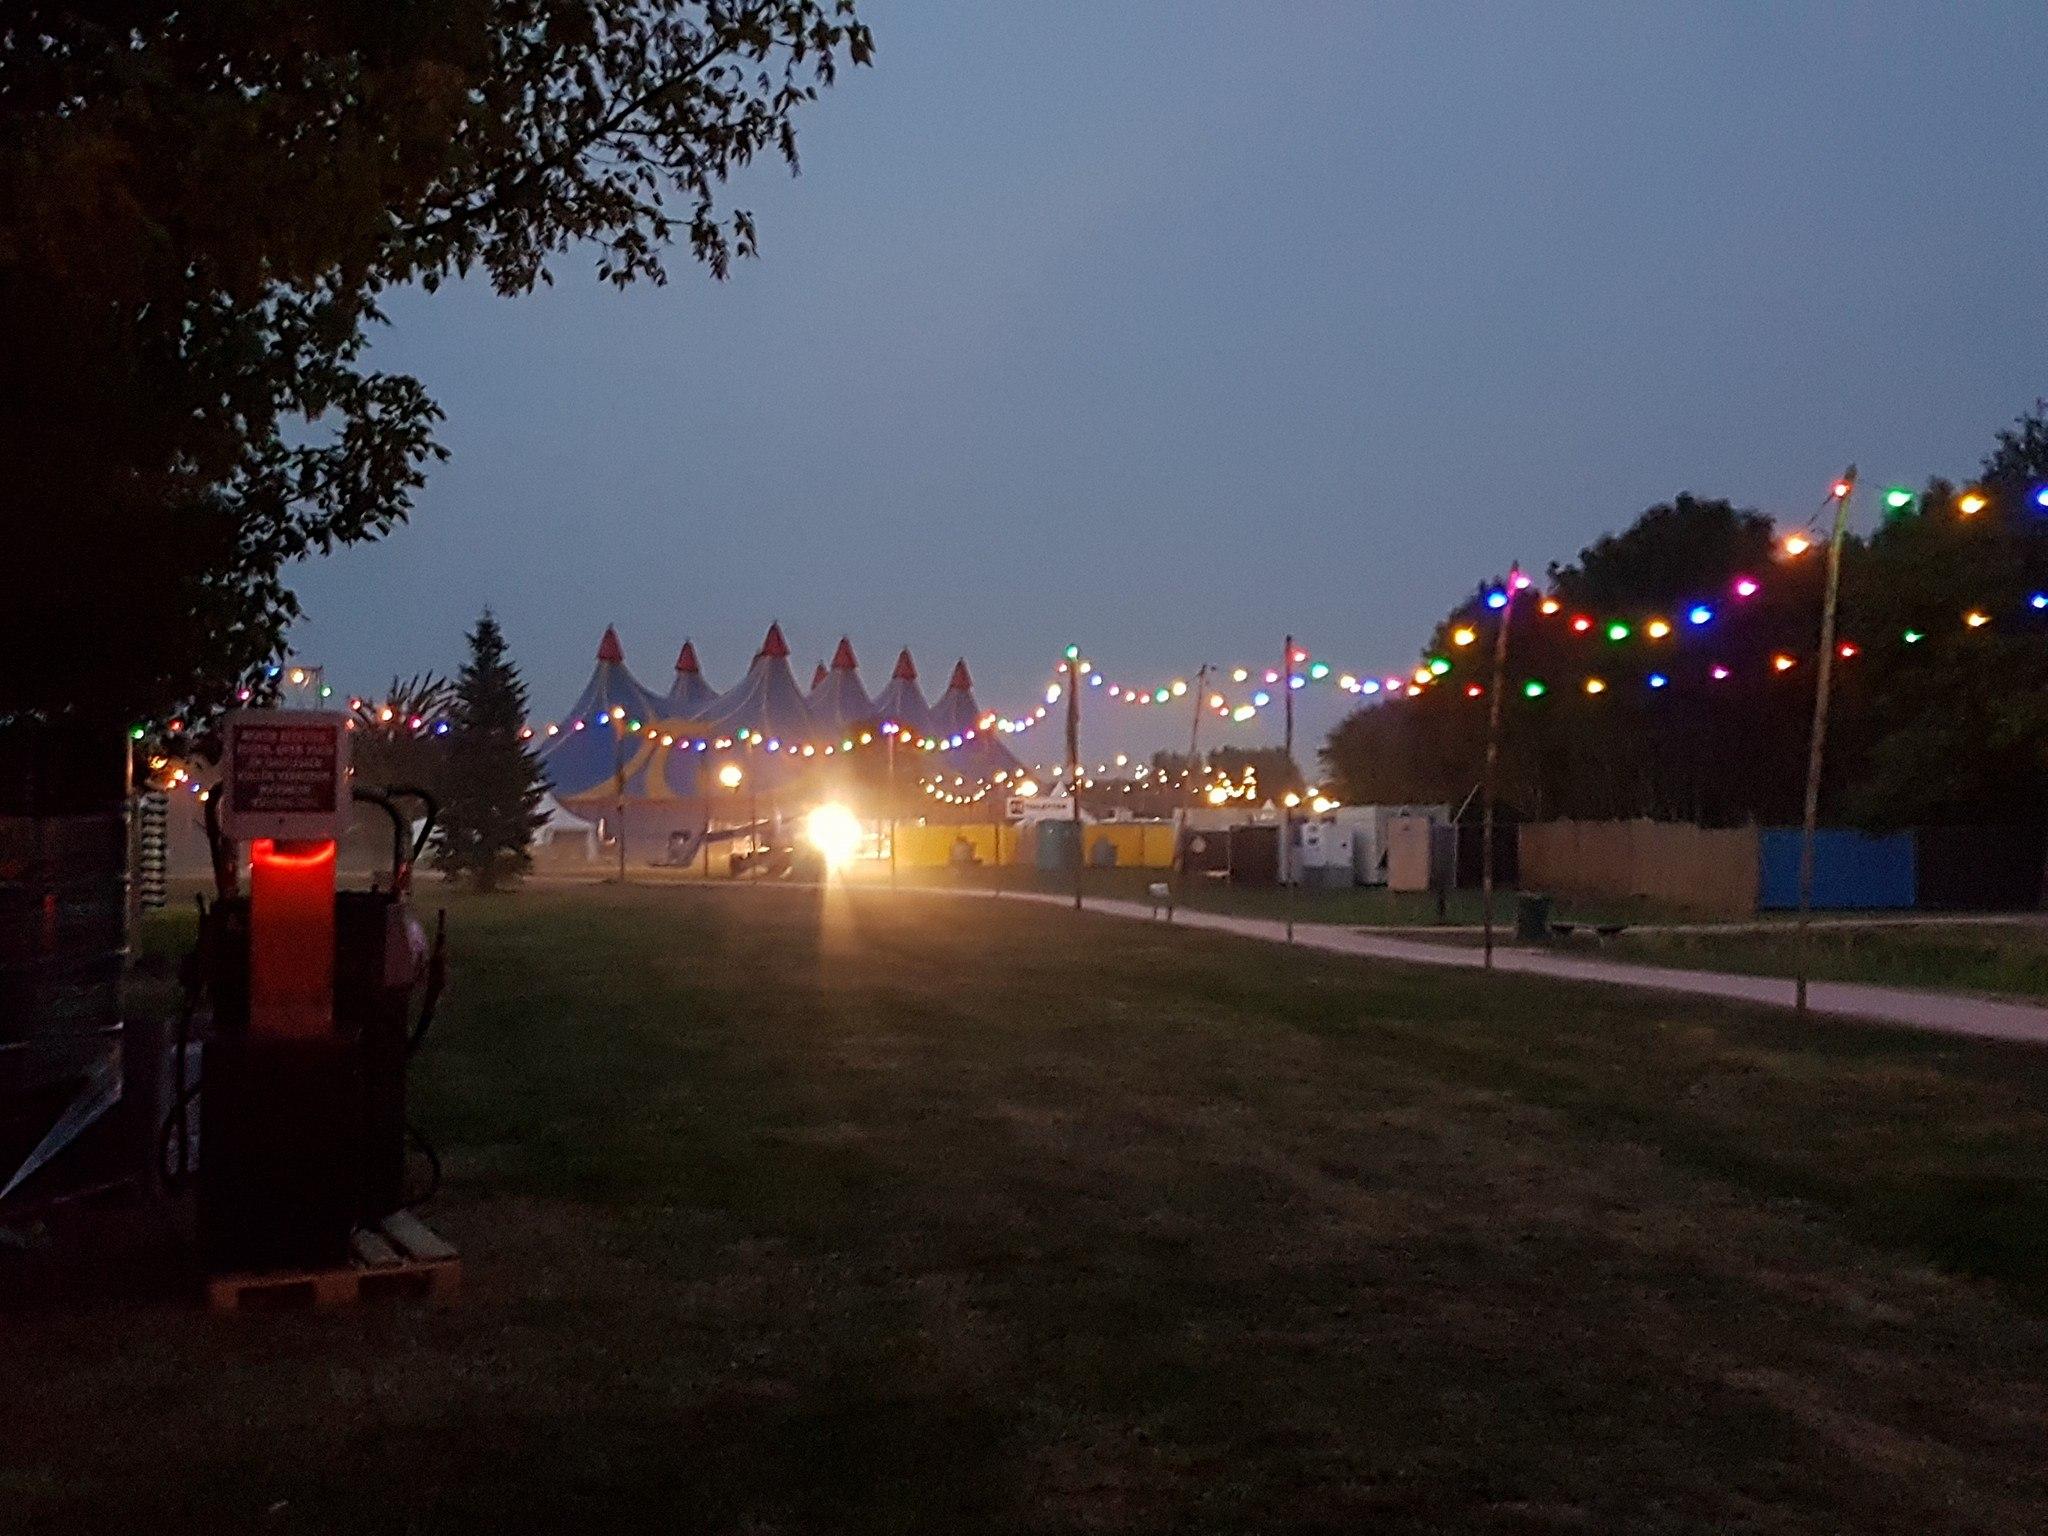 Gekleurde Led Lampen : Prikkabel meter gekleurde led lampen huren